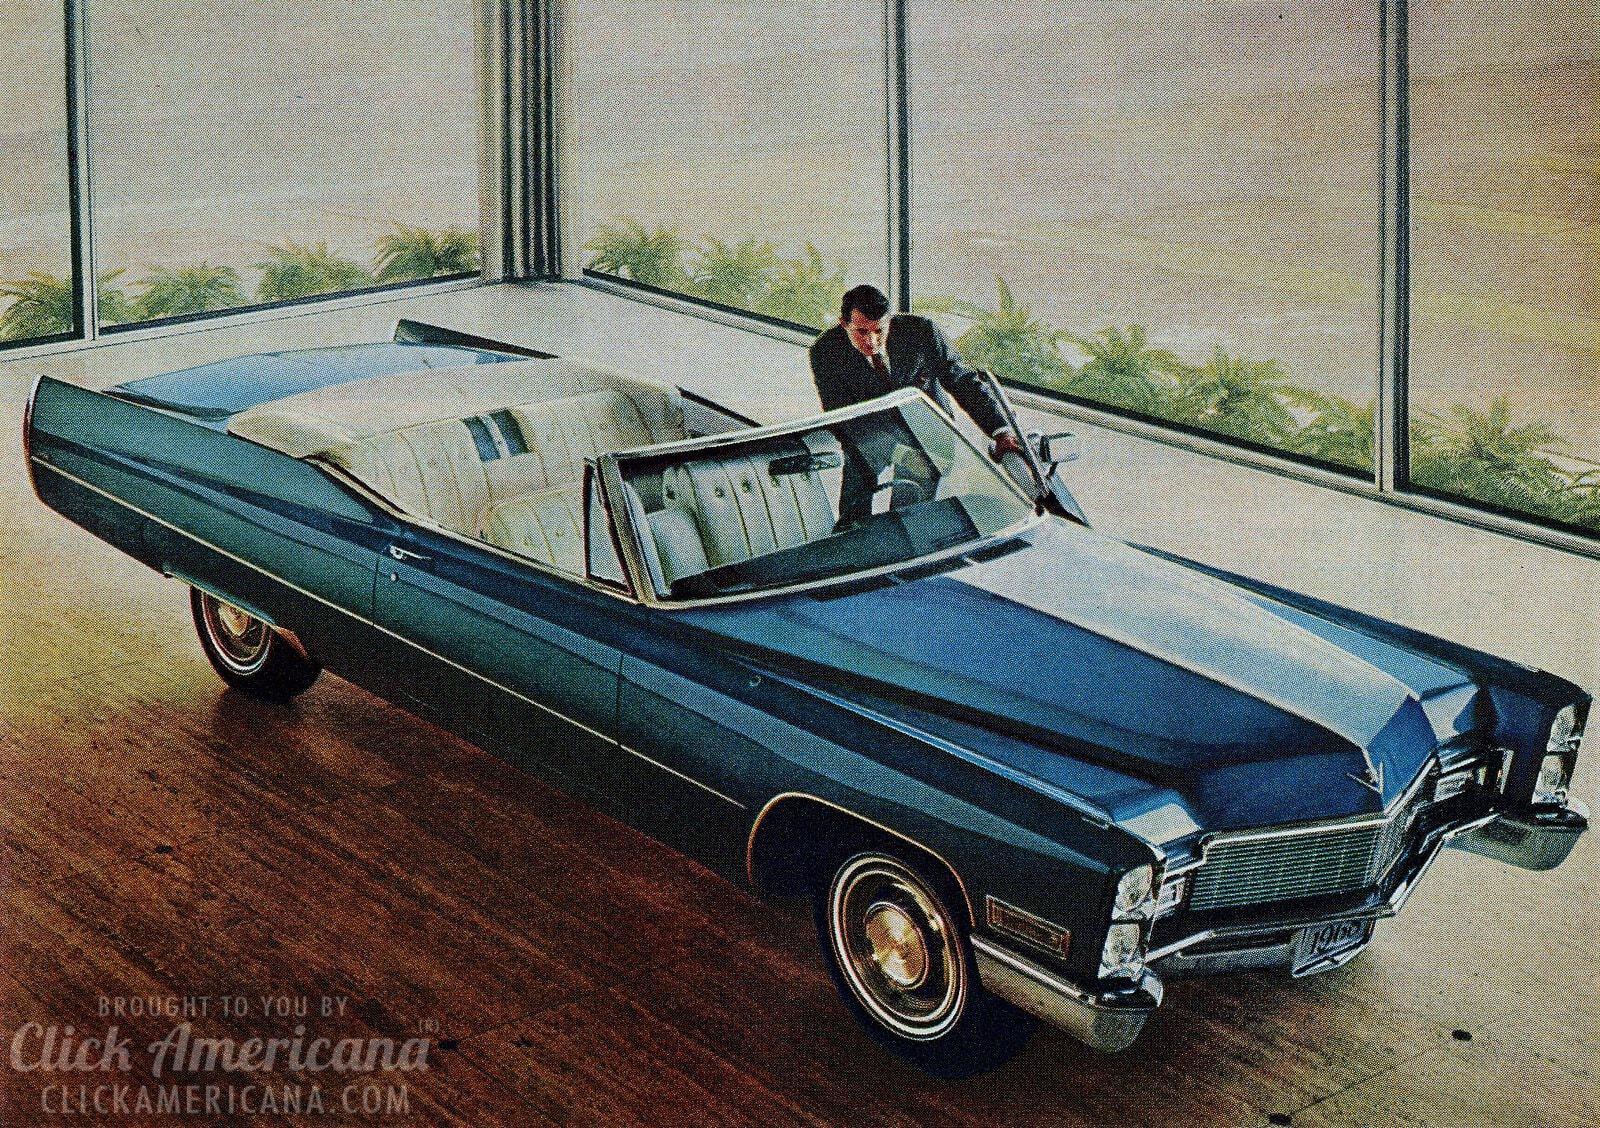 Vintage 1968 Cadillac Ads Click Americana